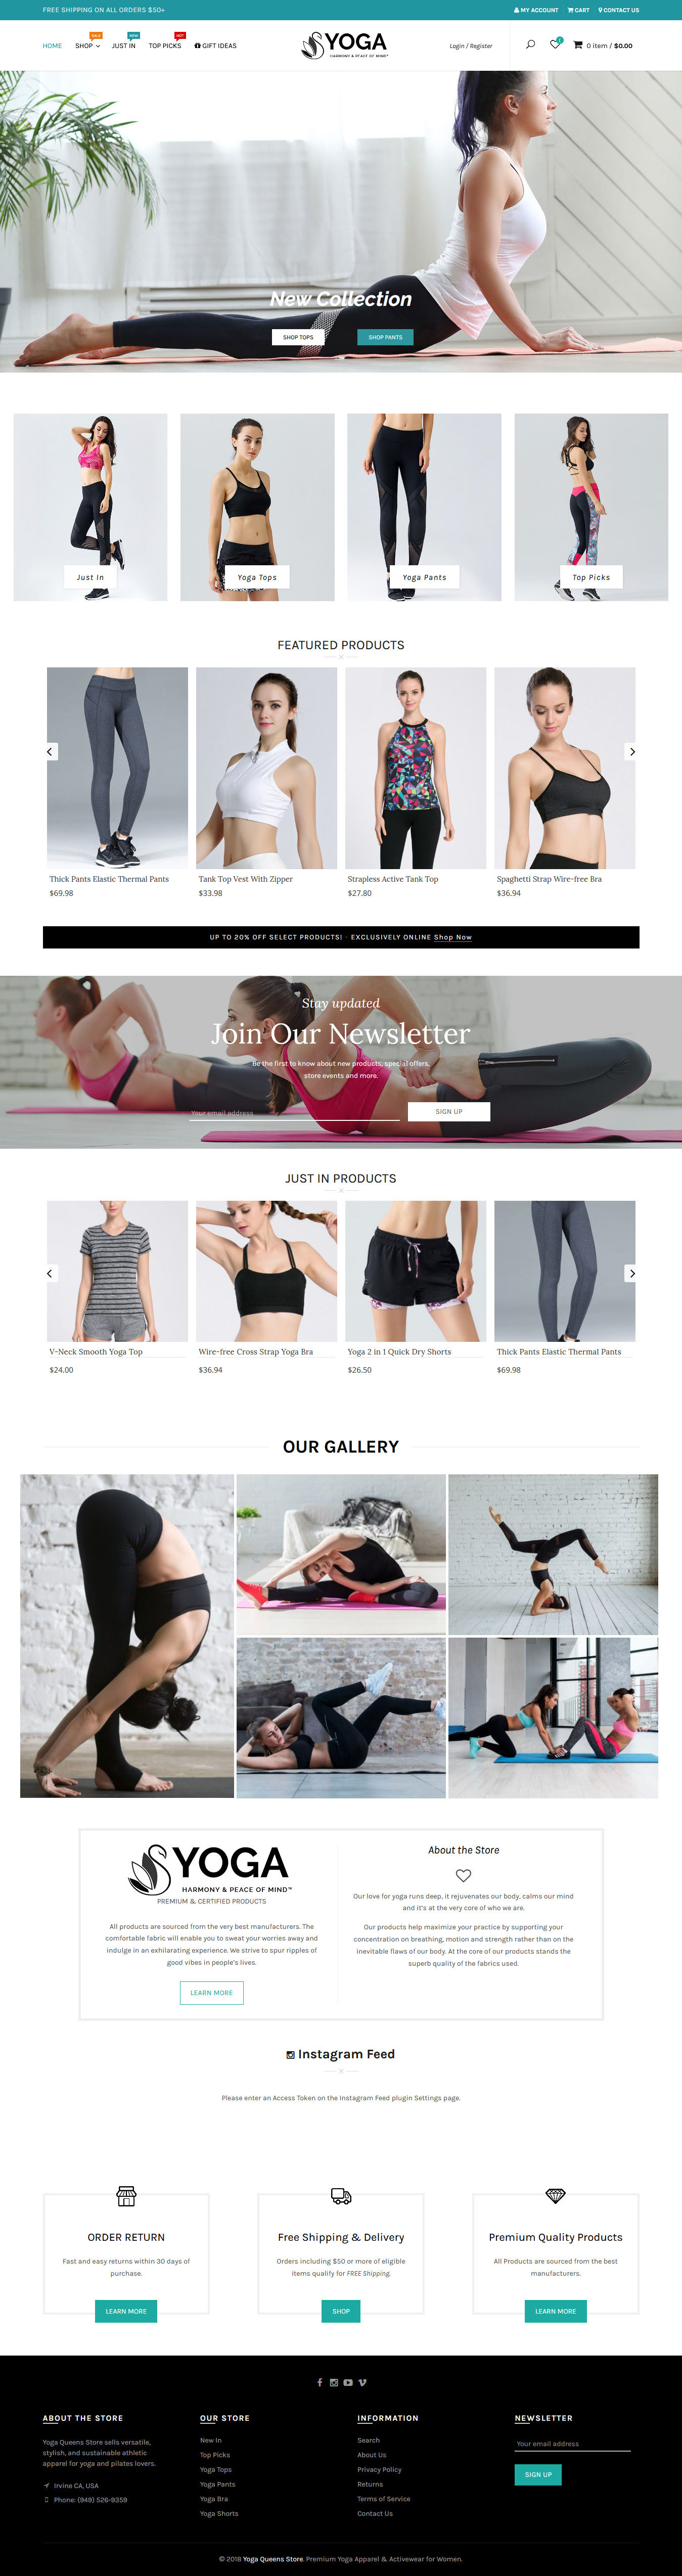 Yoga Queens Store